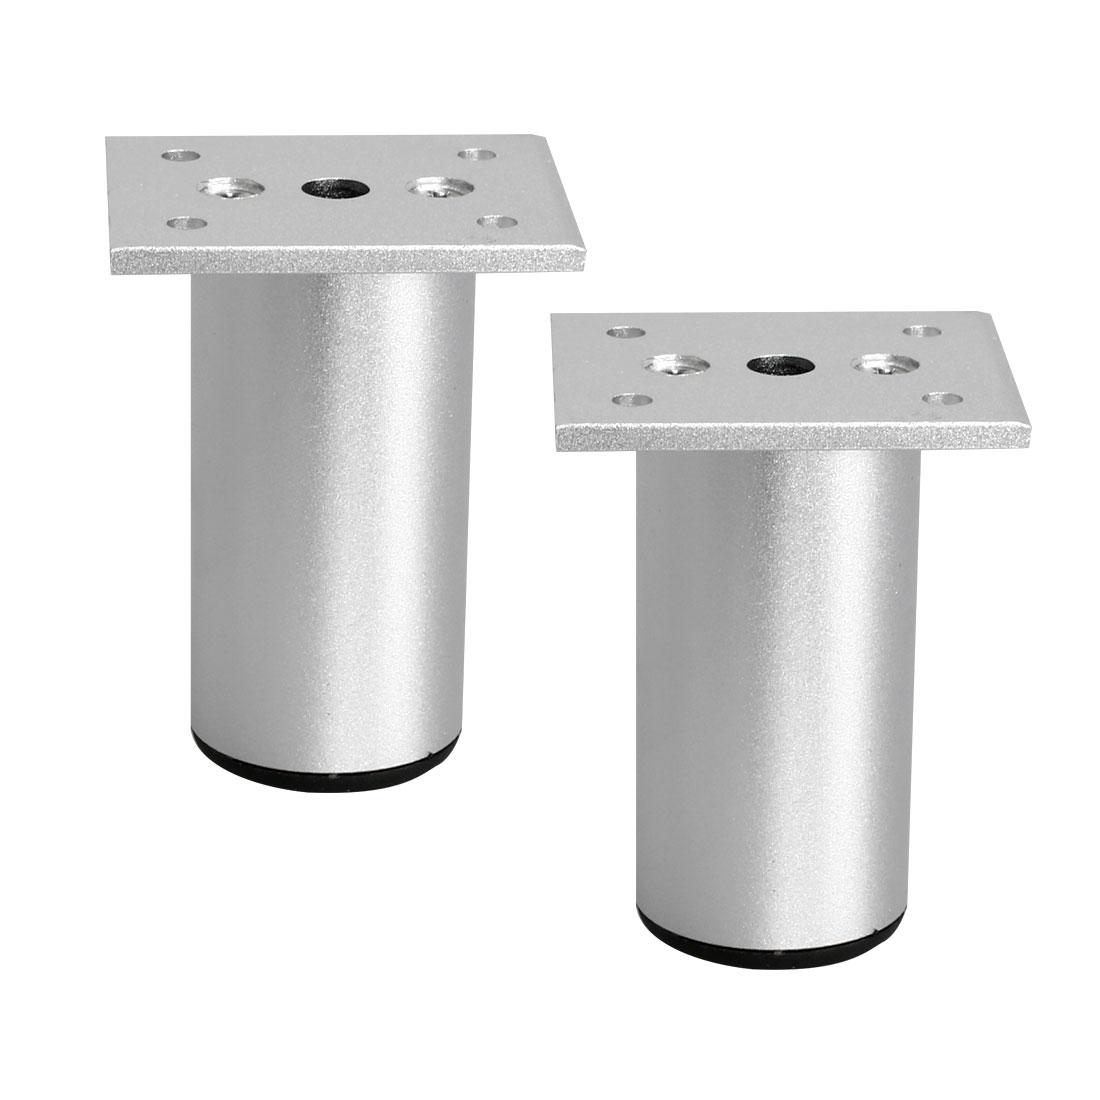 "3"" Furniture Legs Aluminium Alloy Sofa Table Replacement Height Adjuster 2pcs"